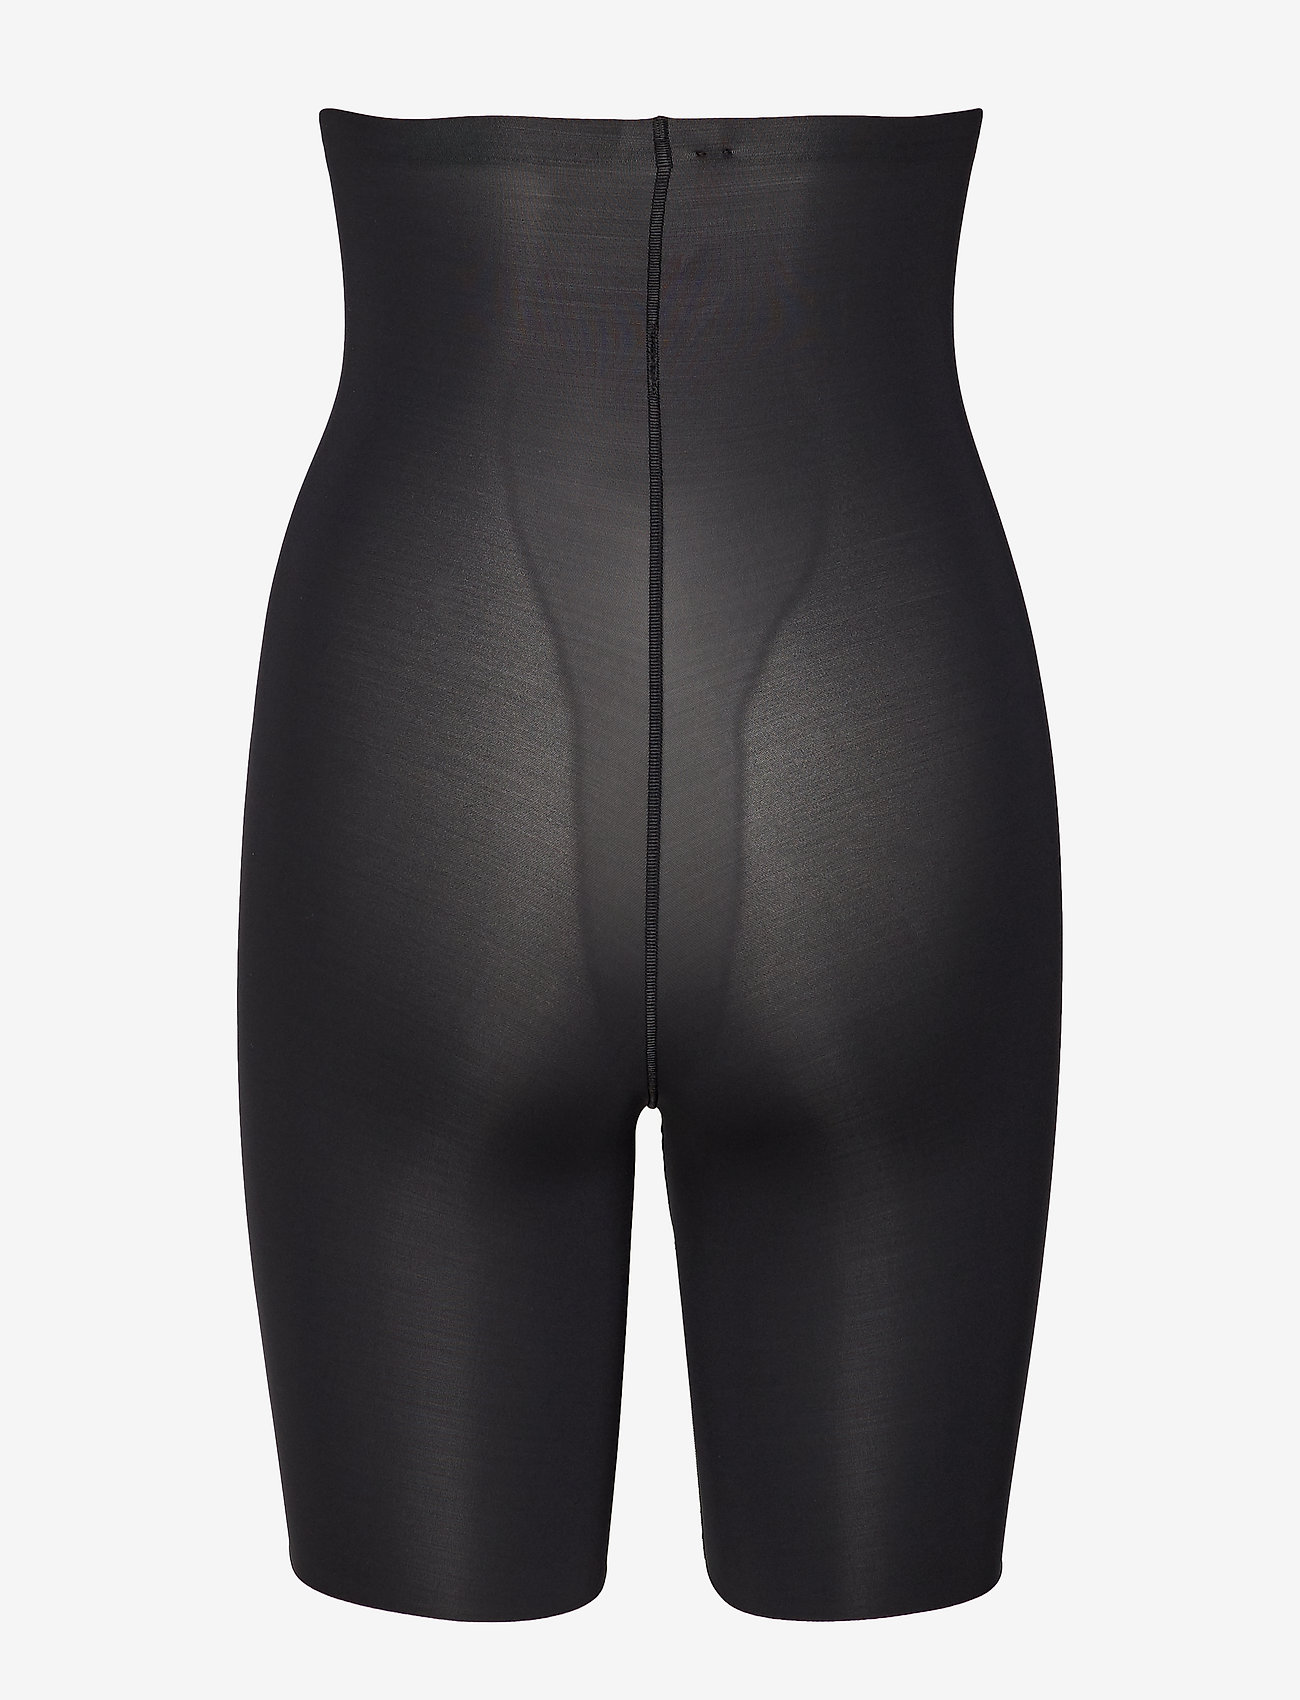 Spanx - HIGH-WAIST SH - bottoms - black - 1